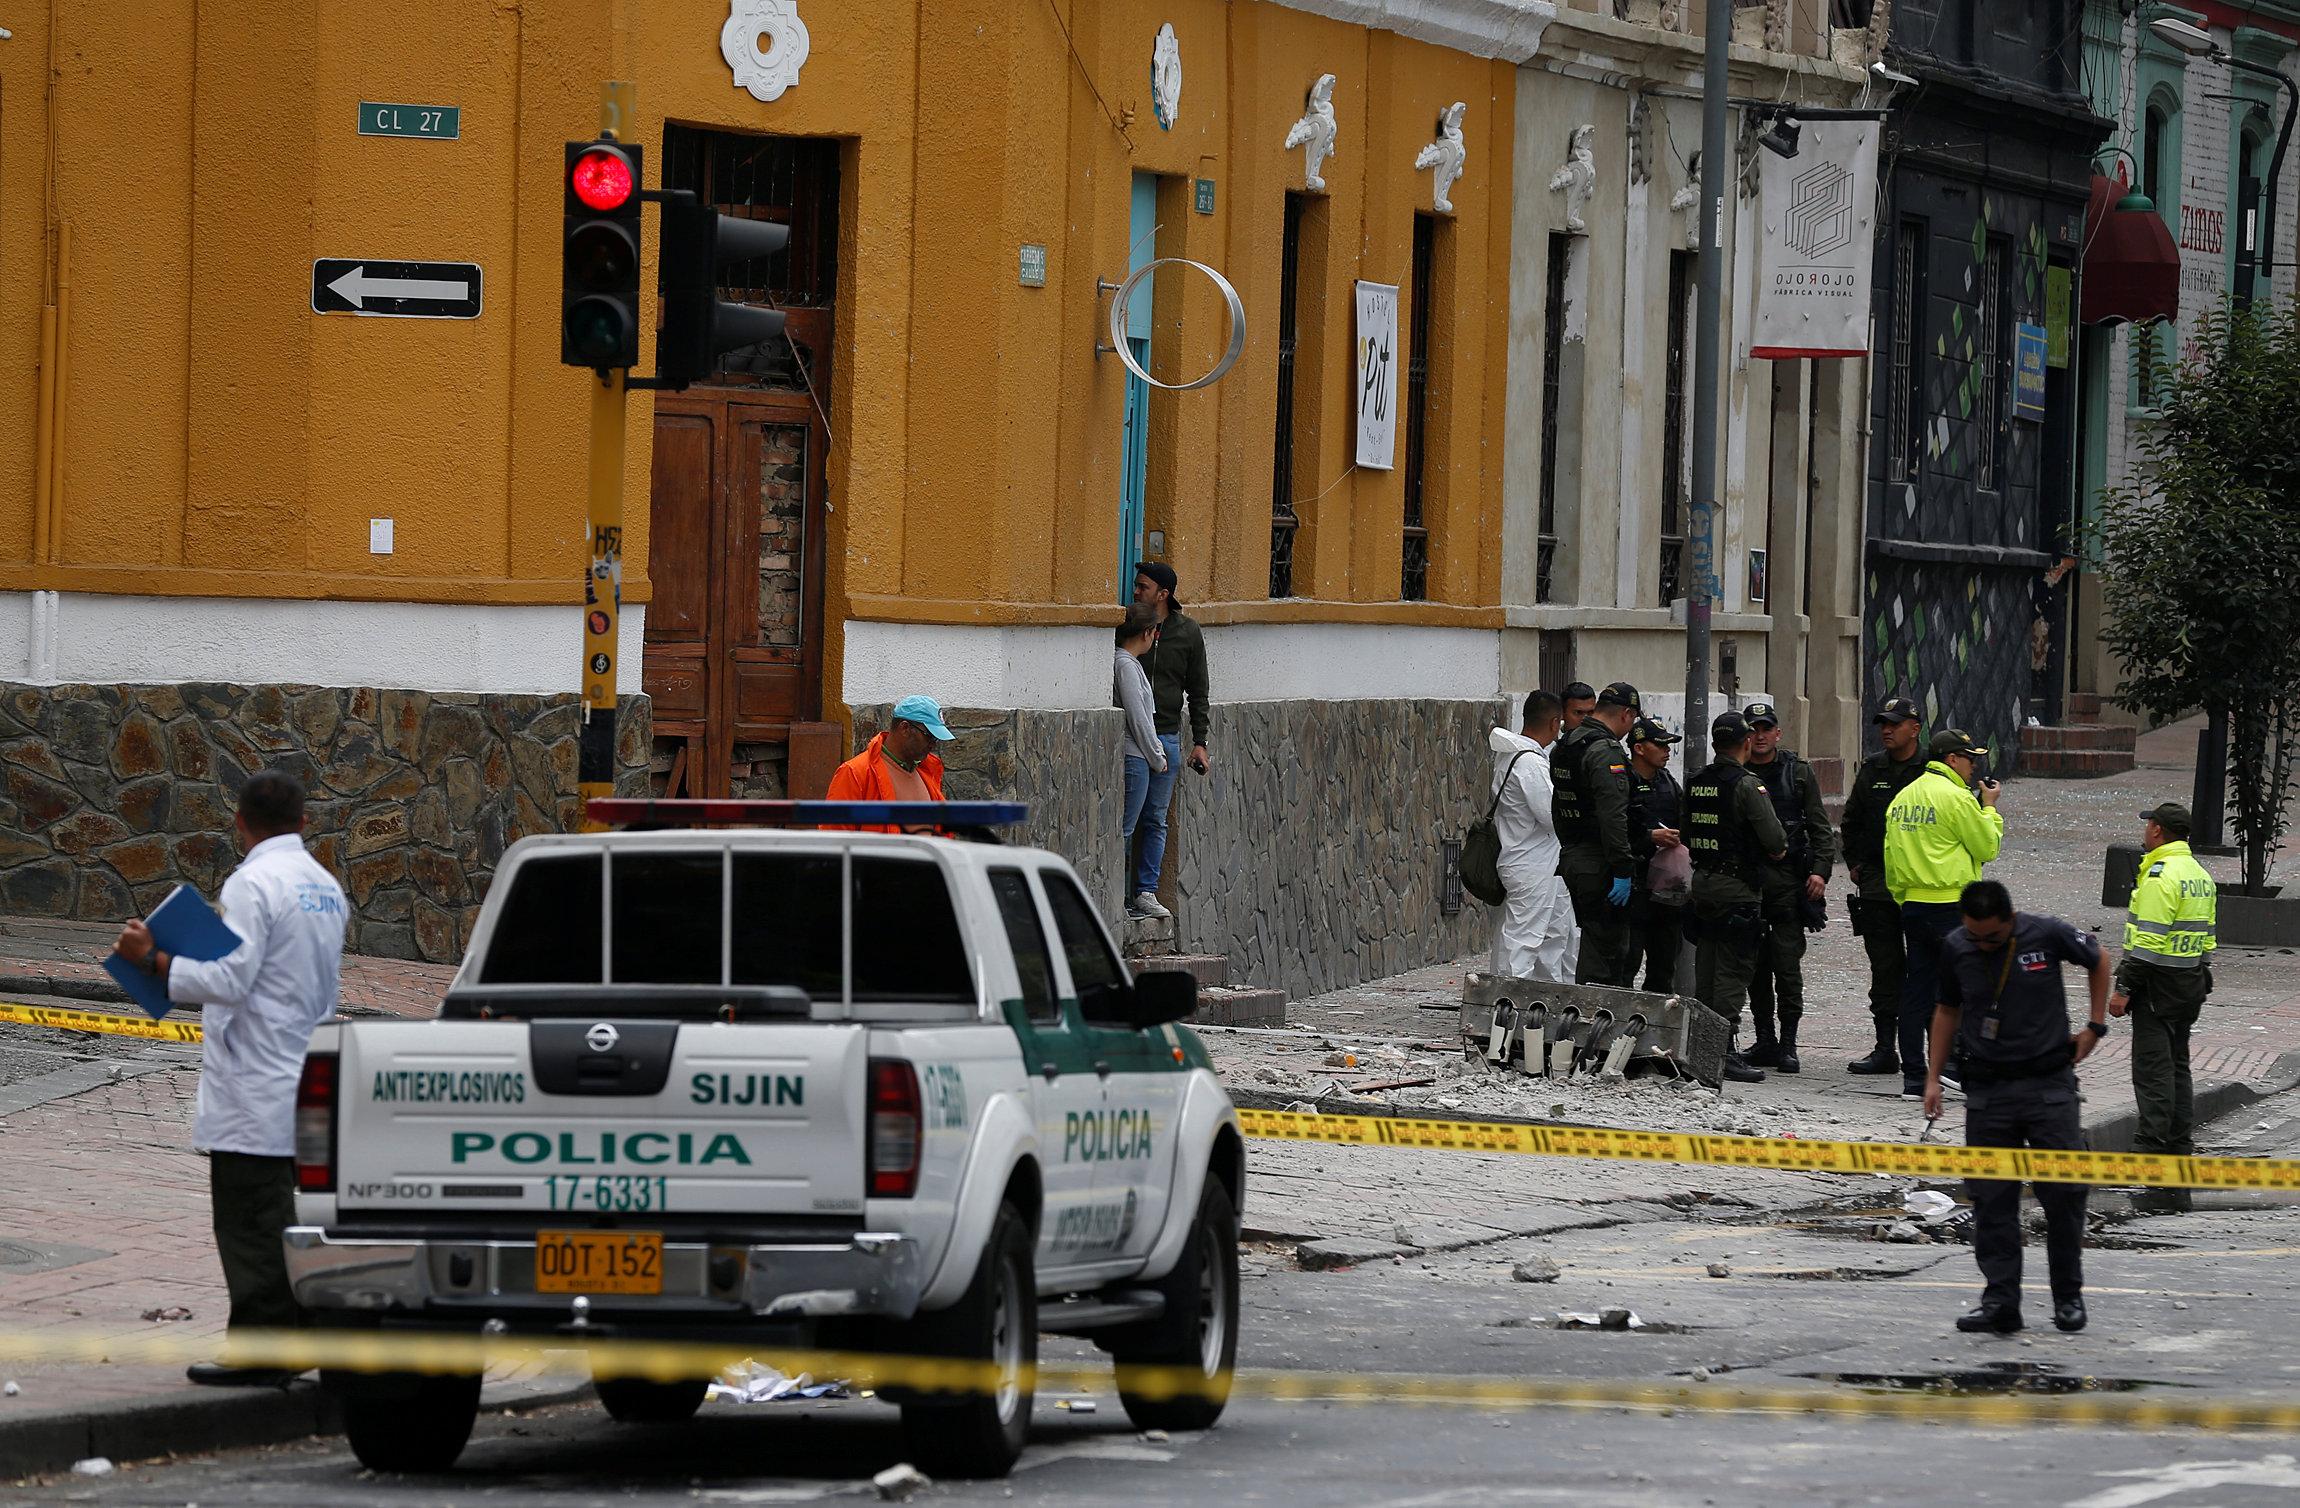 REUTERS/Jaime Saldarriaga TPX IMAGES OF THE DAY